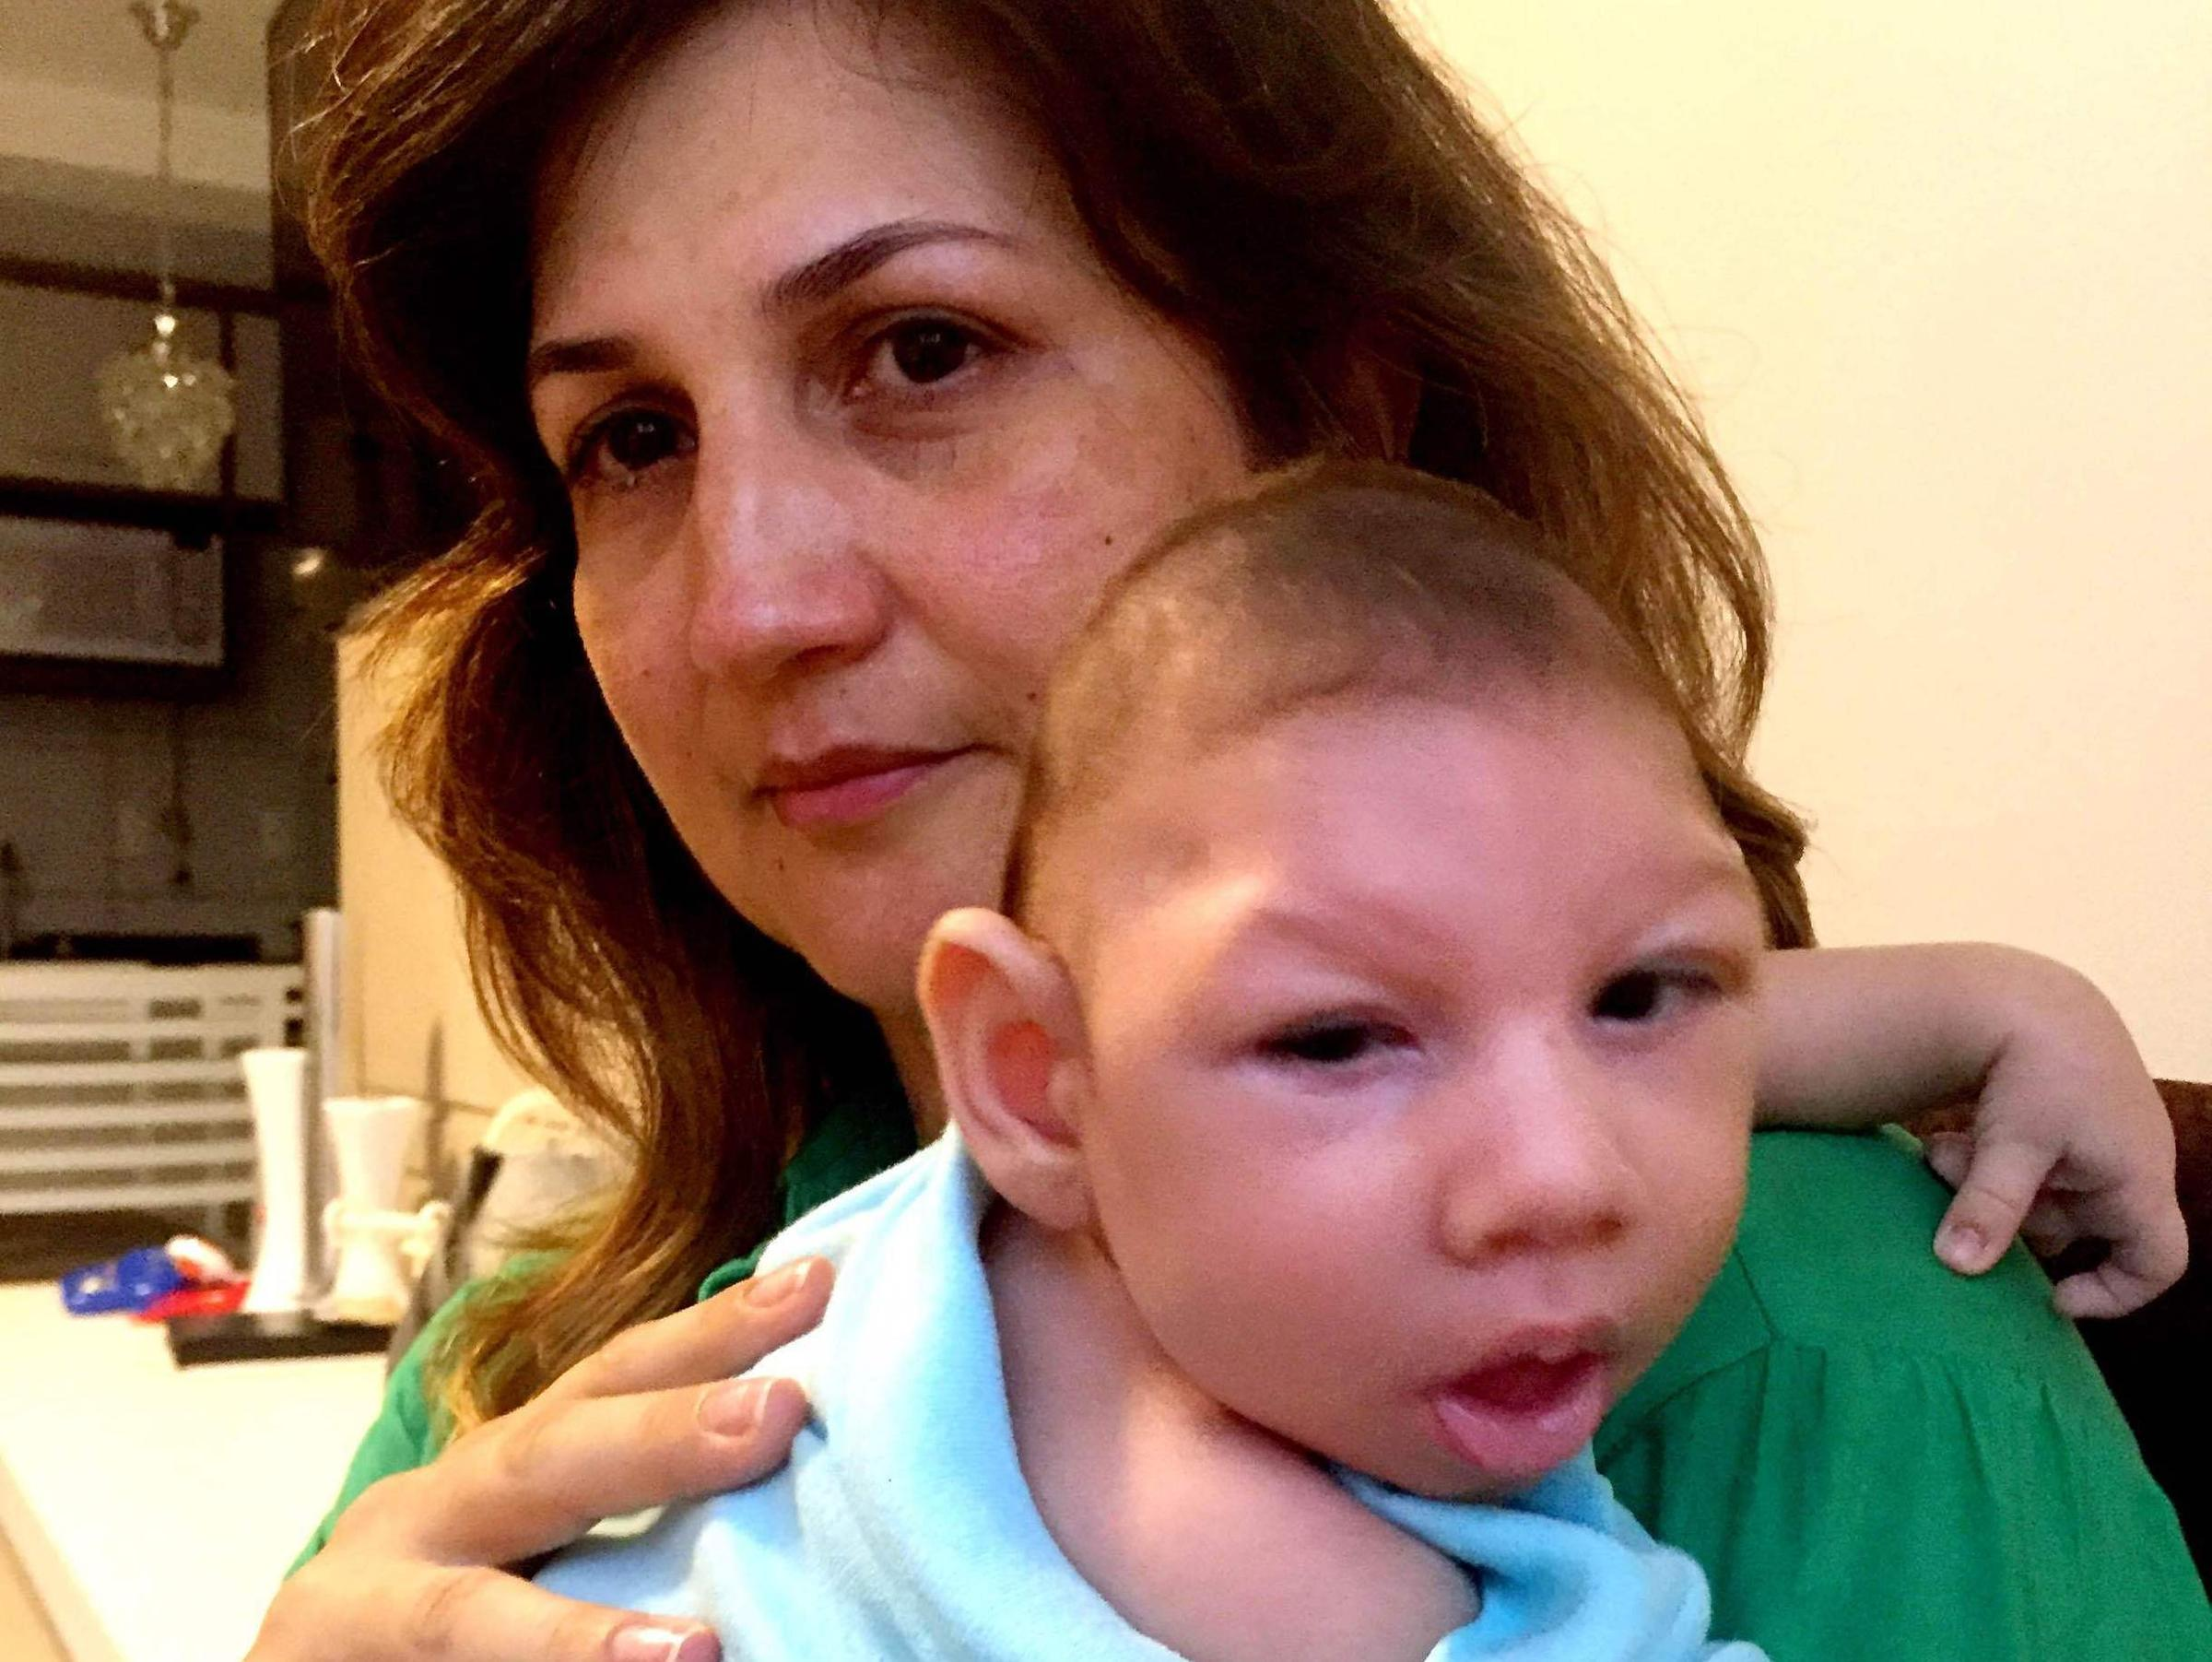 zika birth defect